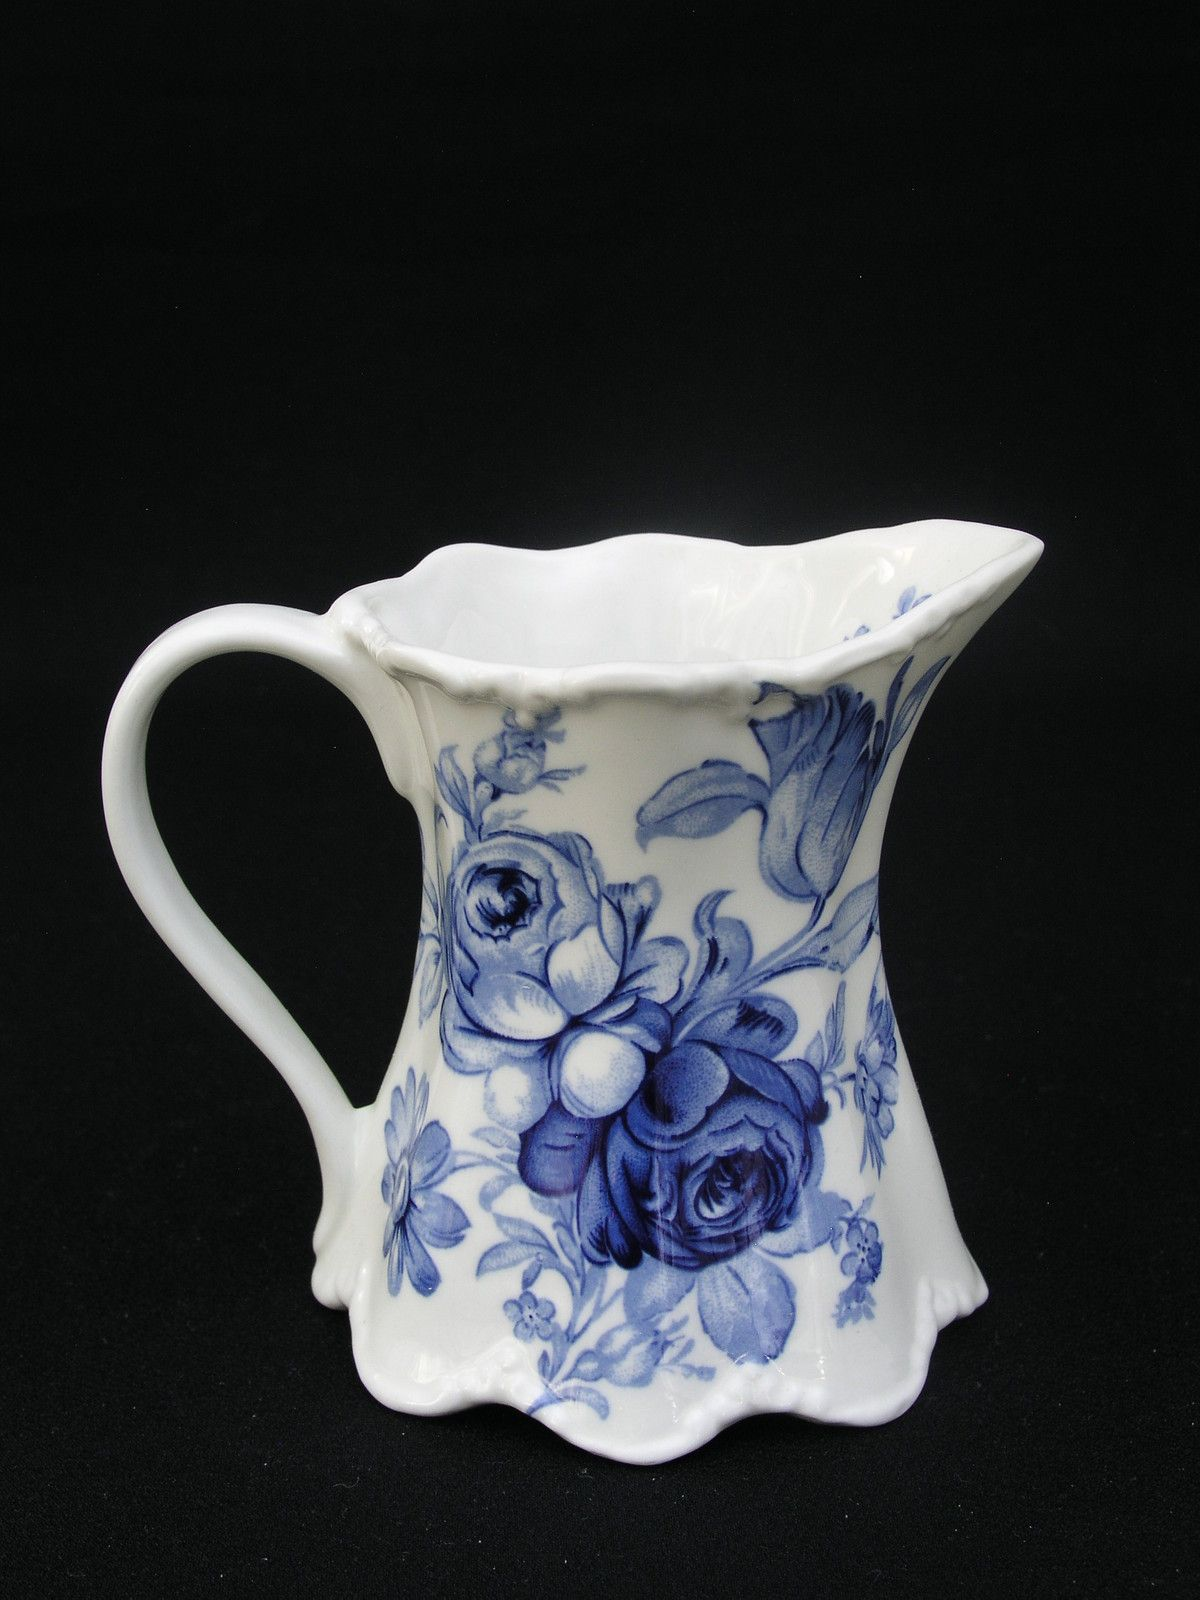 St George Fine Bone China Creamer Blue Flowers On White Very Pretty Ebay Dishes